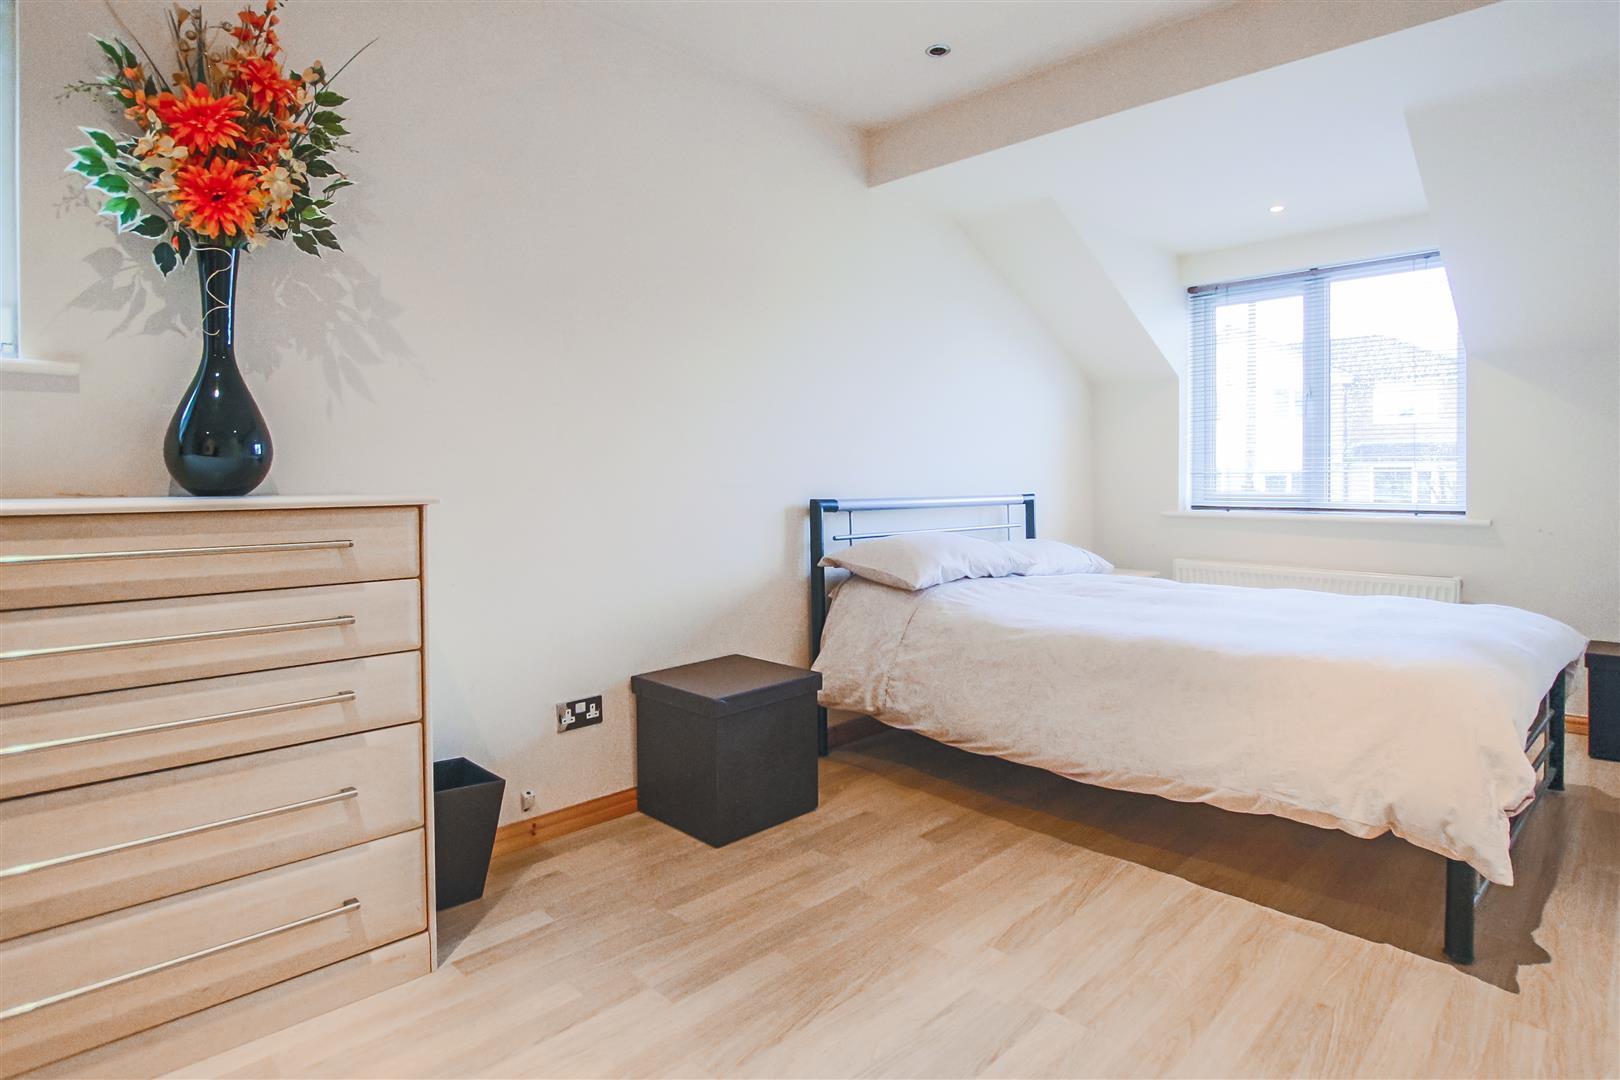 5 Bedroom Detached House For Sale - Bedroom